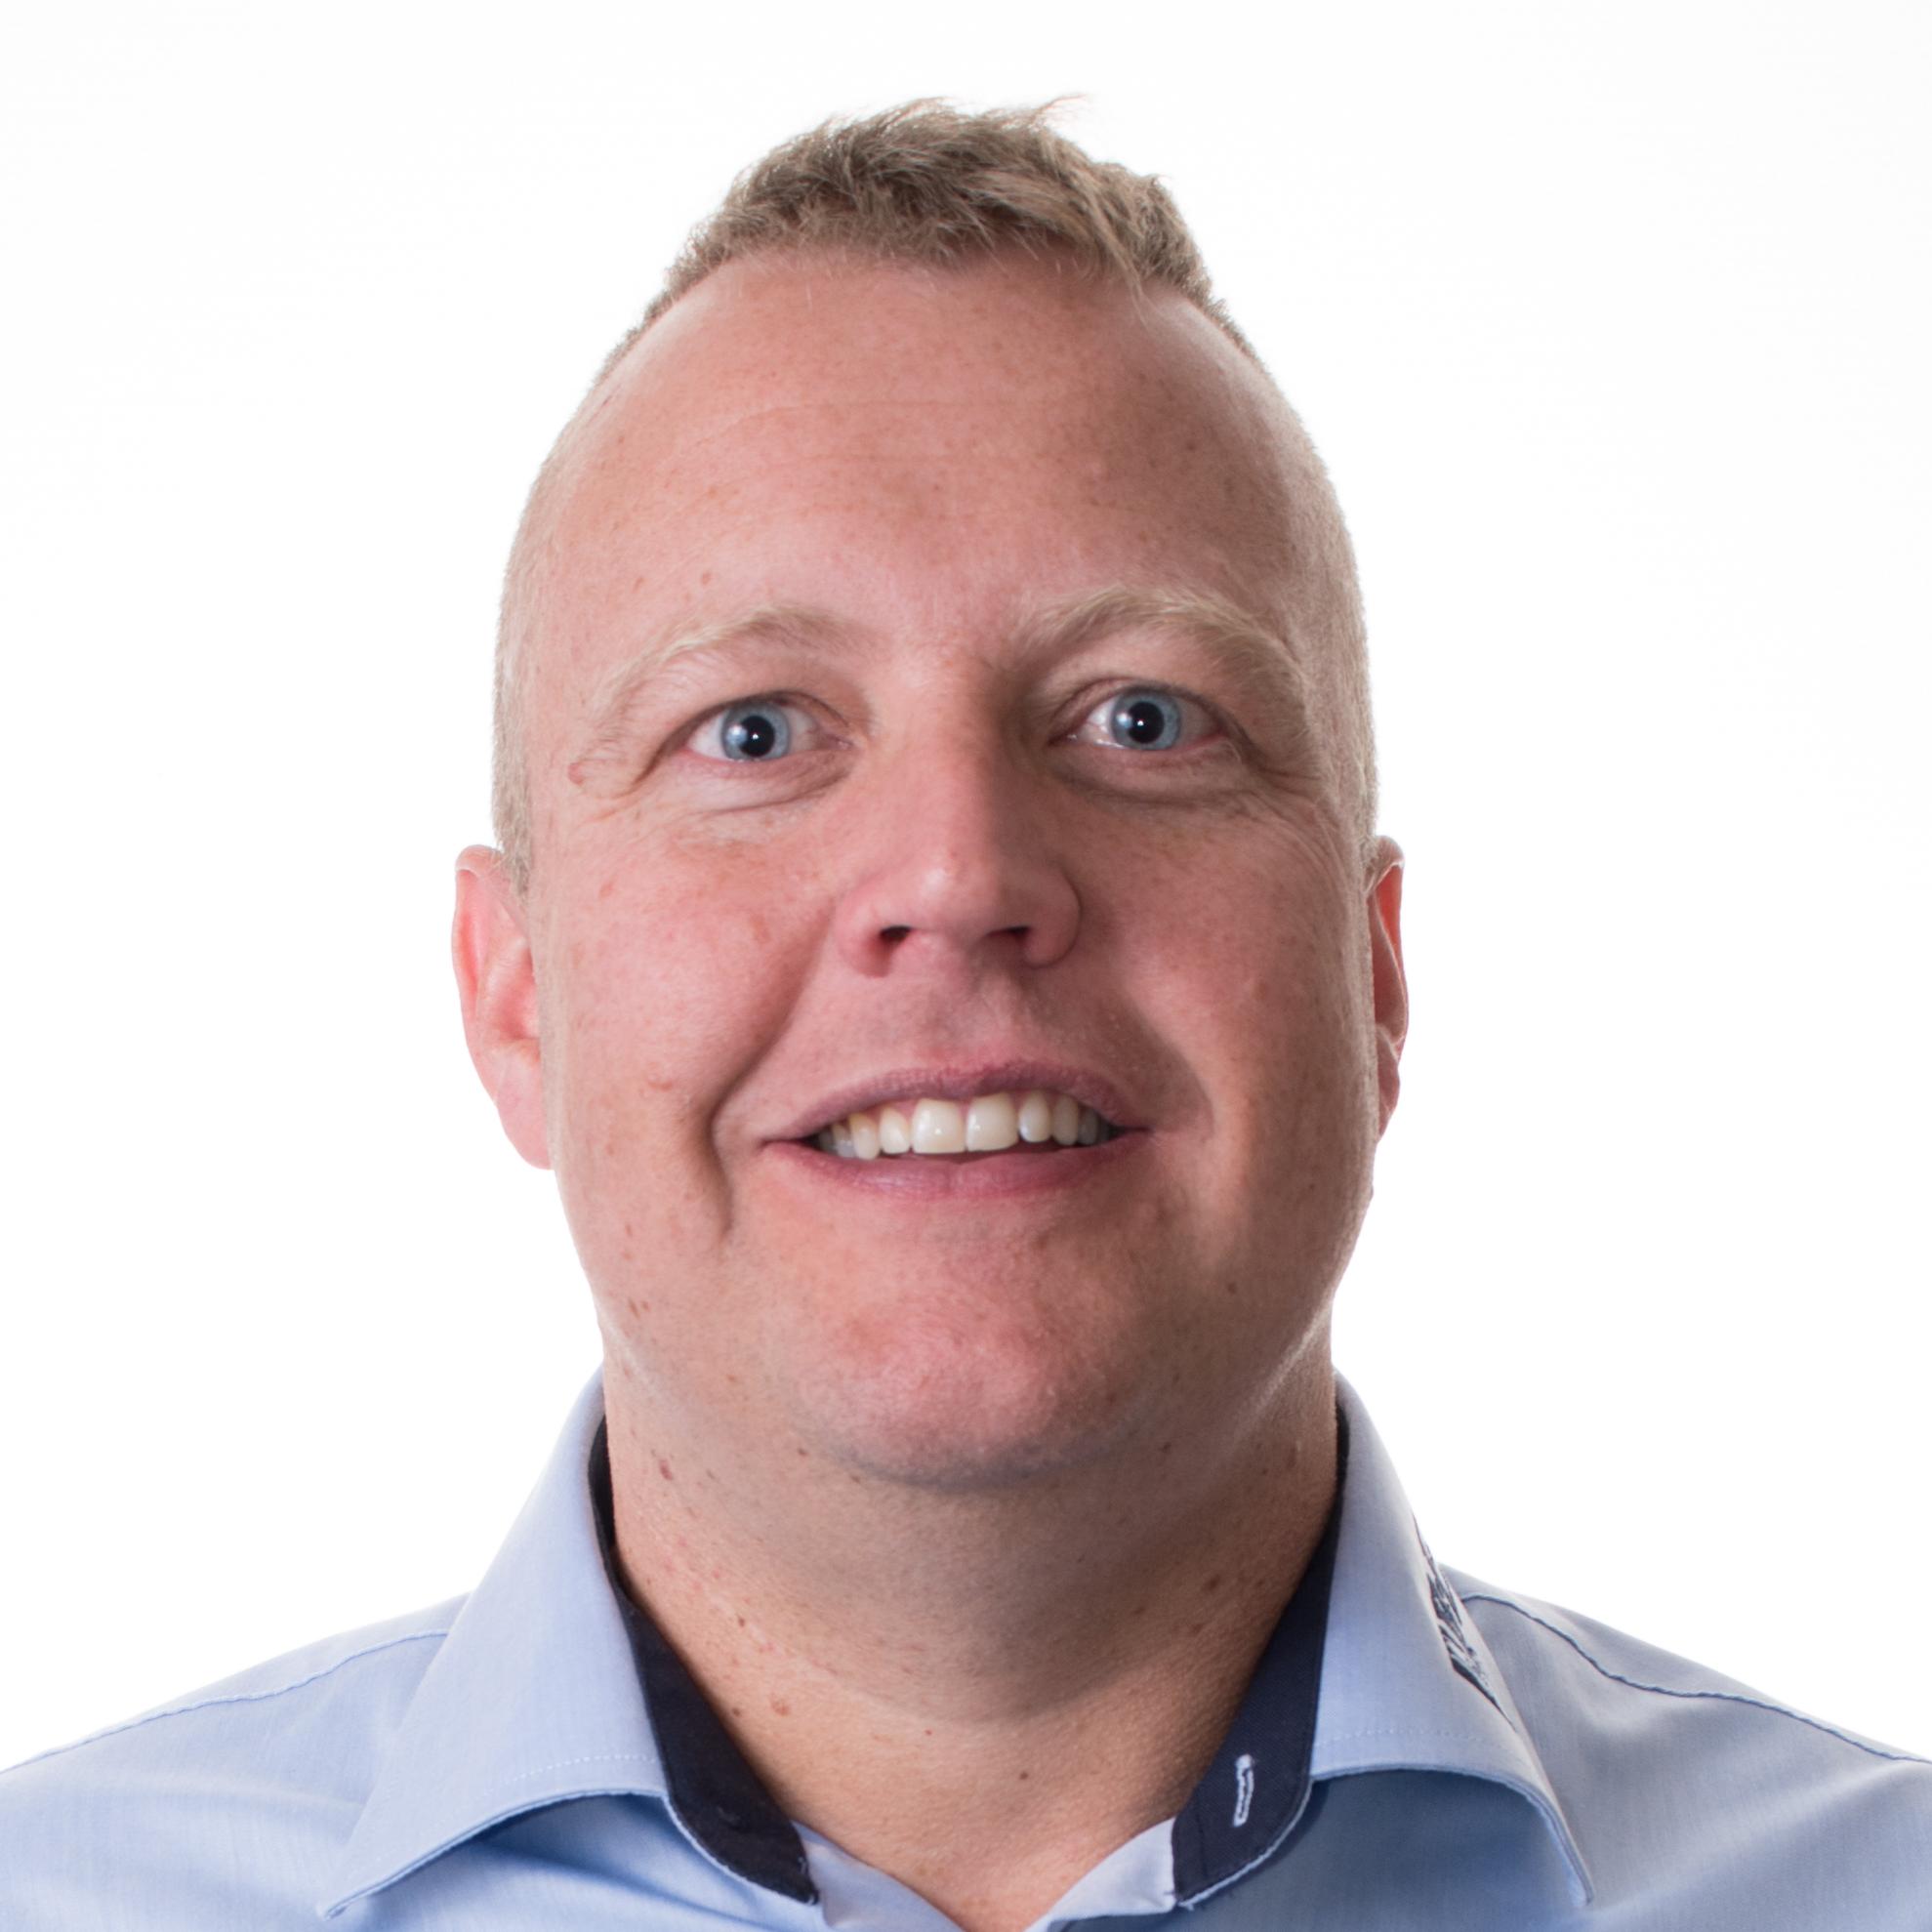 Søren P. Pedersen